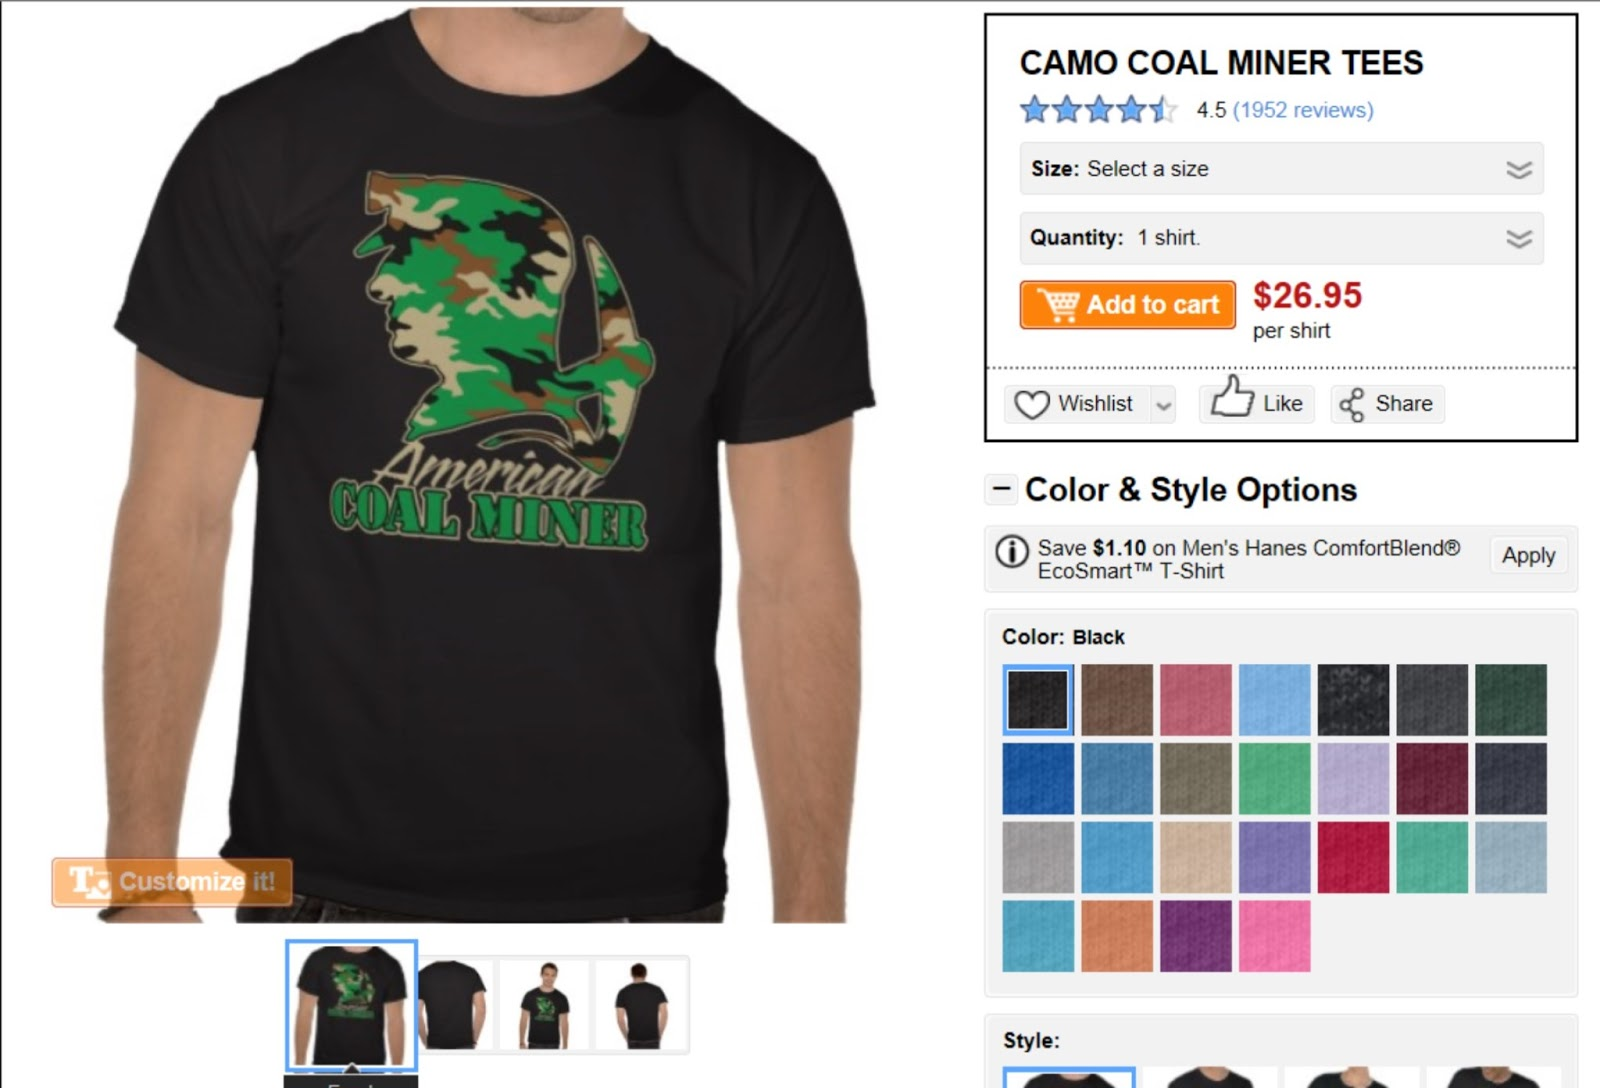 Zazzle t shirt design size - Camo Coal Miner T Shirt By Earl Ferguson